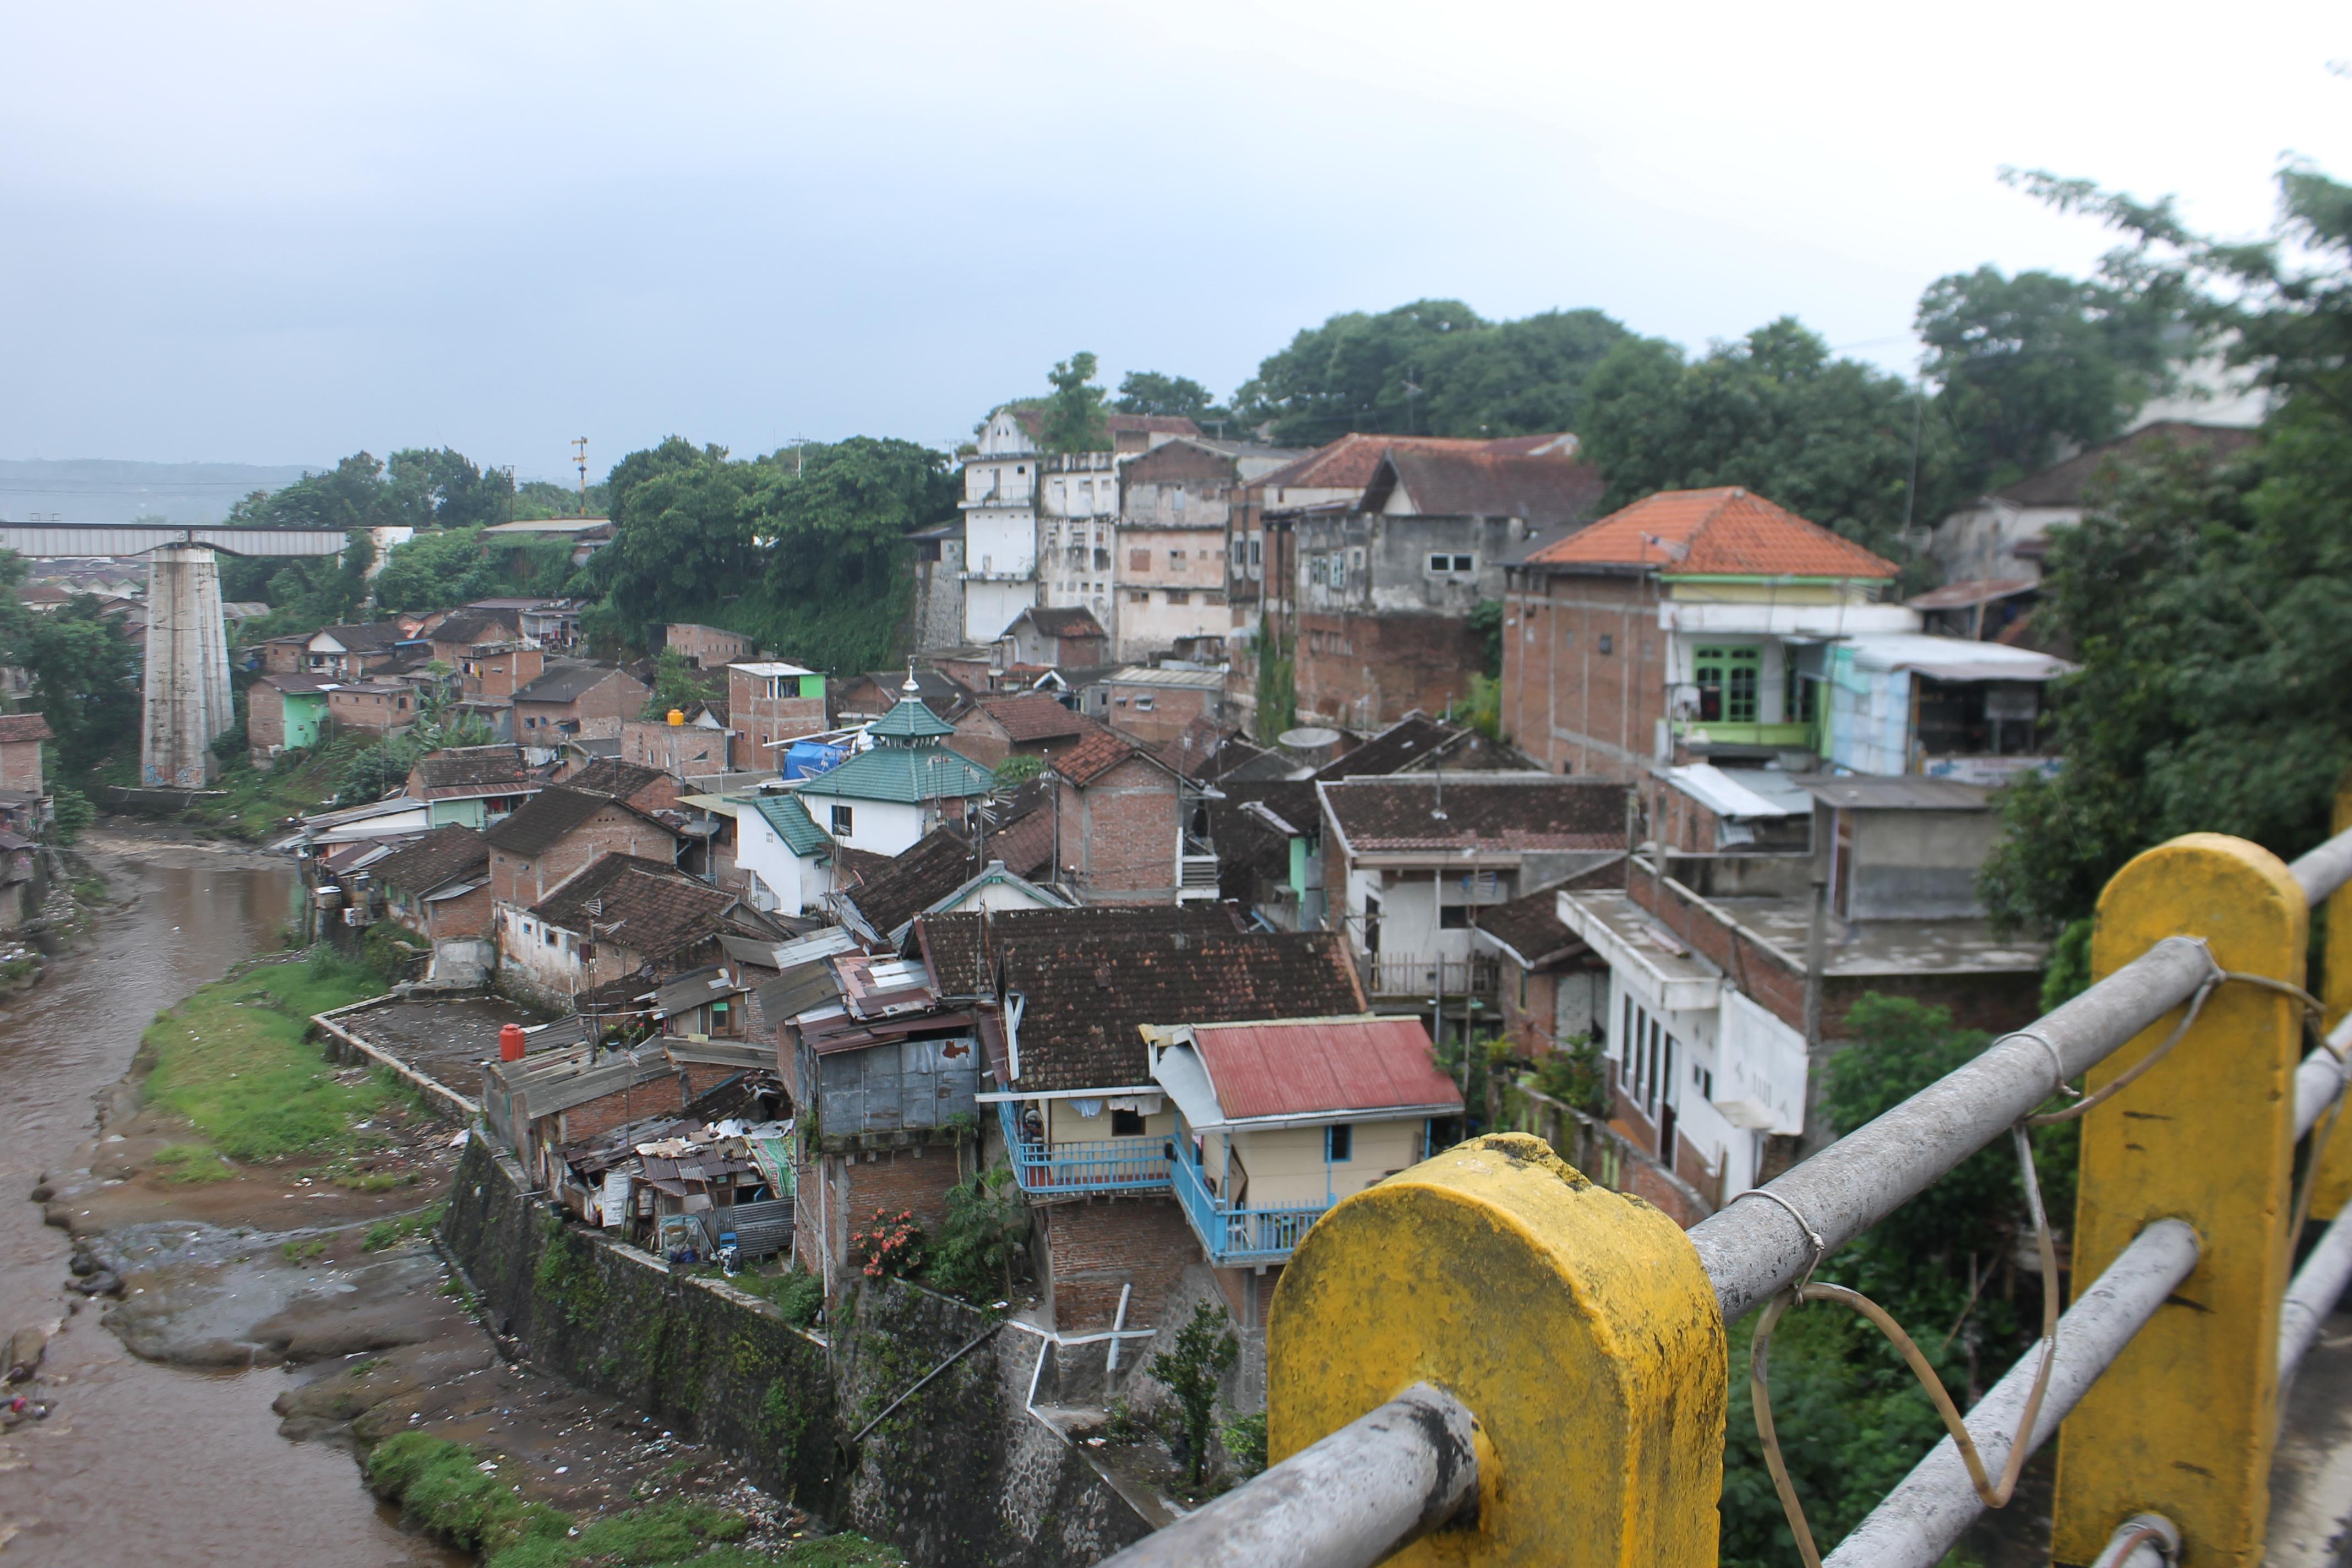 Mari Mengenang Jodipan Dahulu Nanti Ngalam Kampung Warna Warni Kab